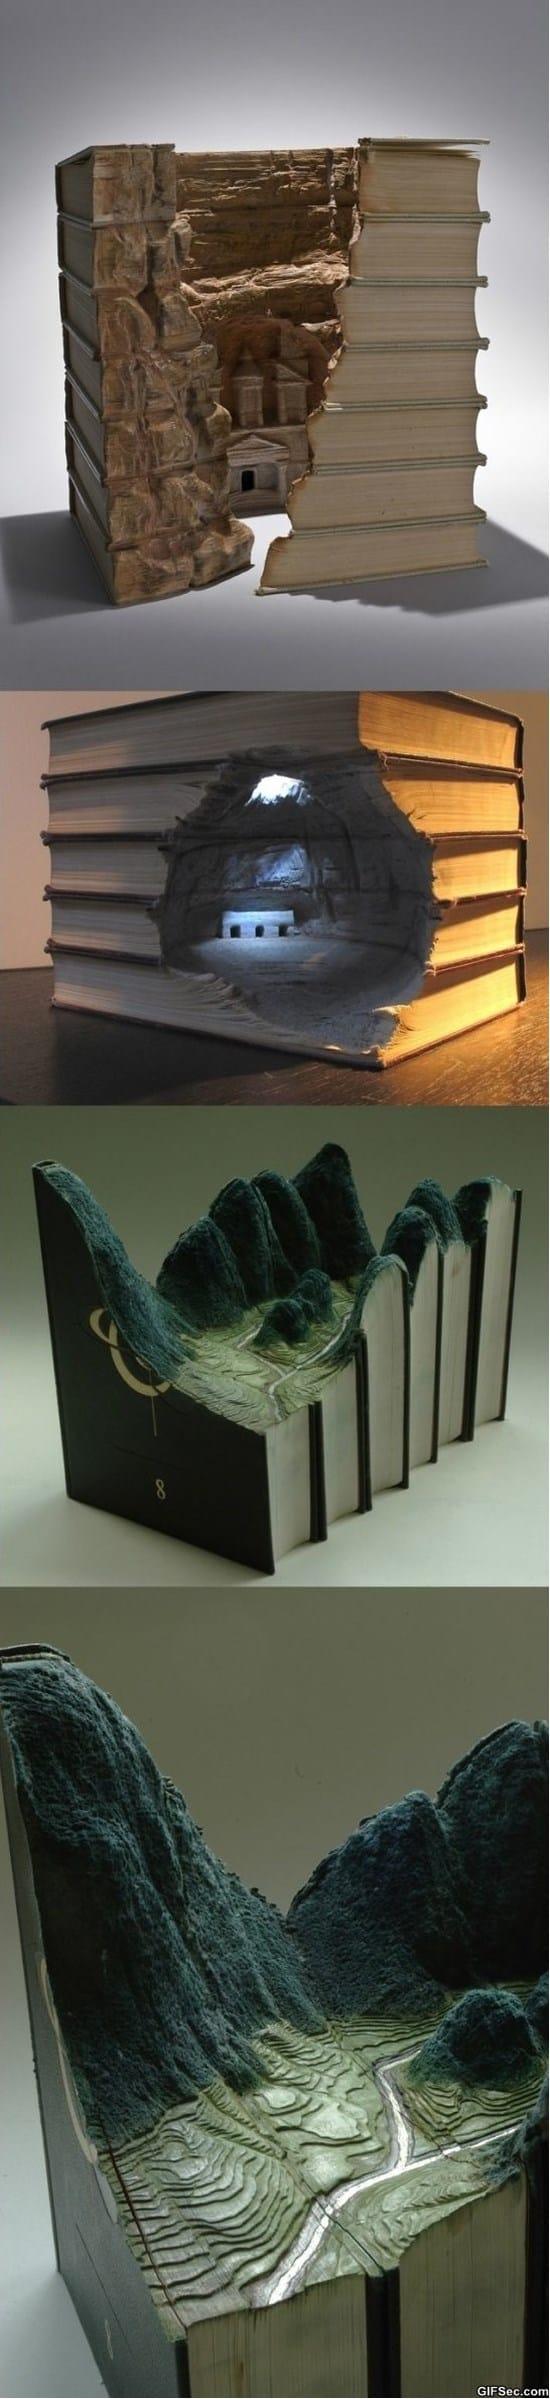 book-art-meme